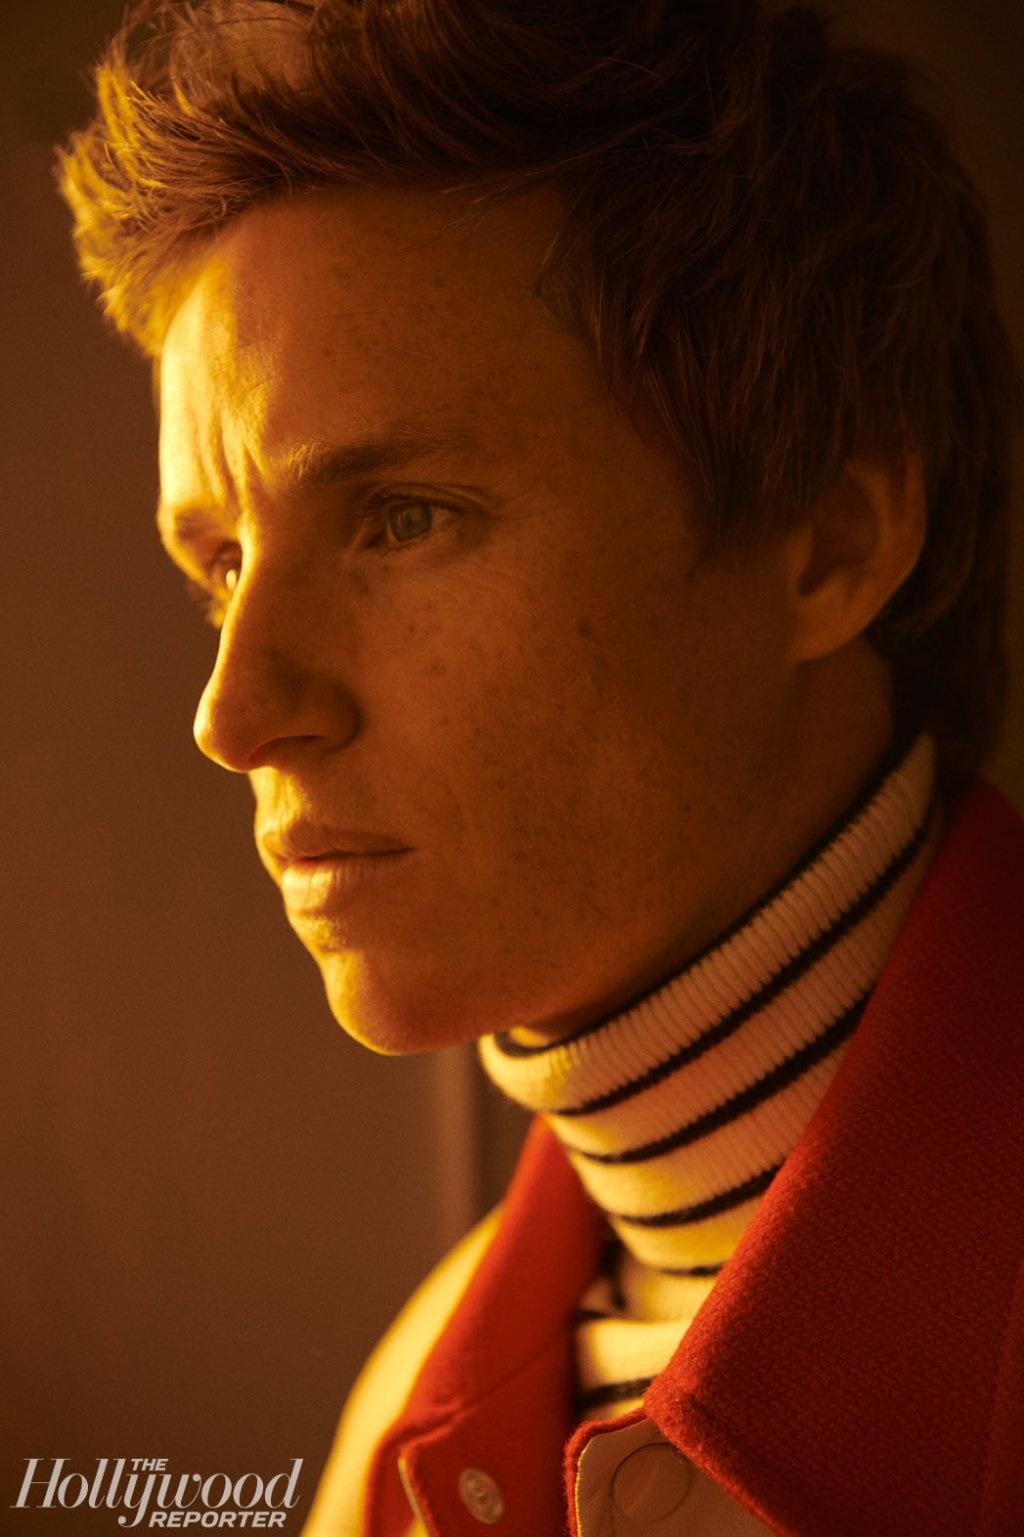 Eddie Redmayne looks introspective in this portrait from the Toronto International Film Festival.